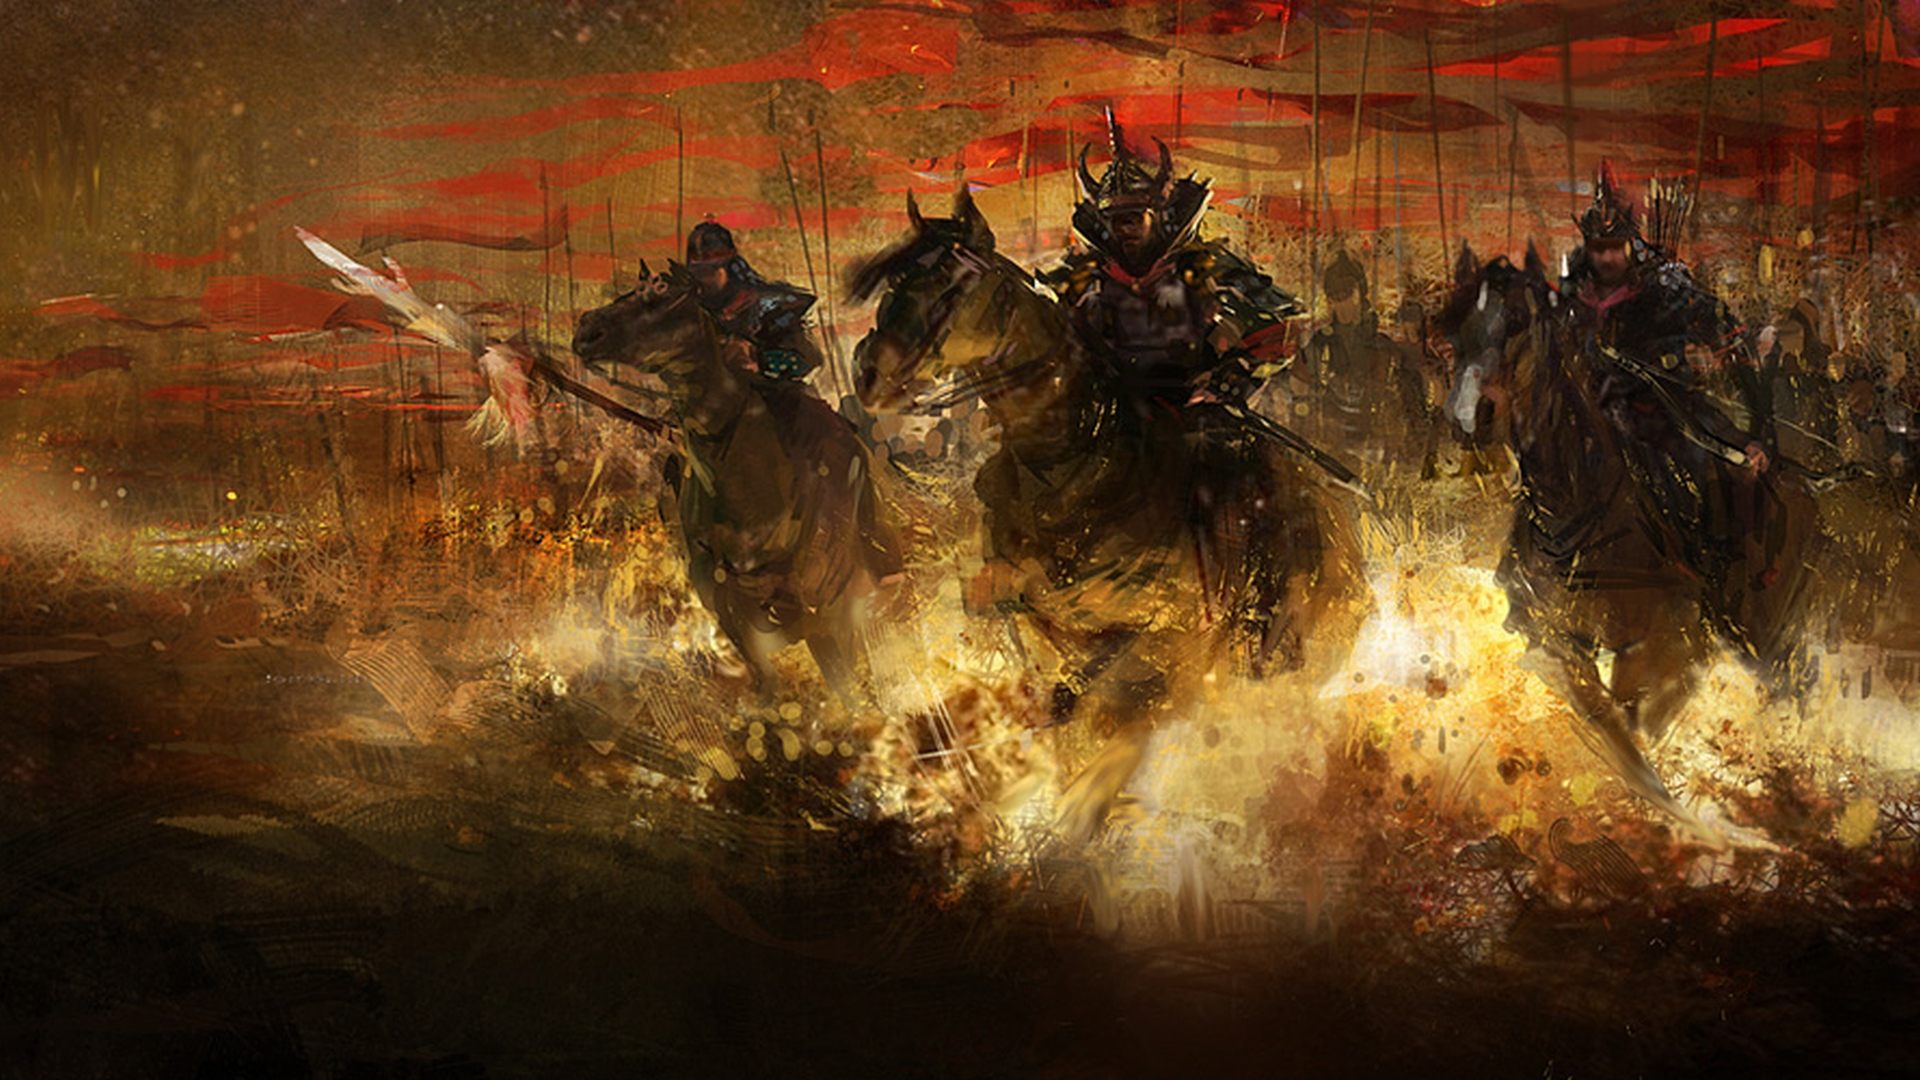 Samurai Hd Wallpaper Background Image 1920x1080 Id 147388